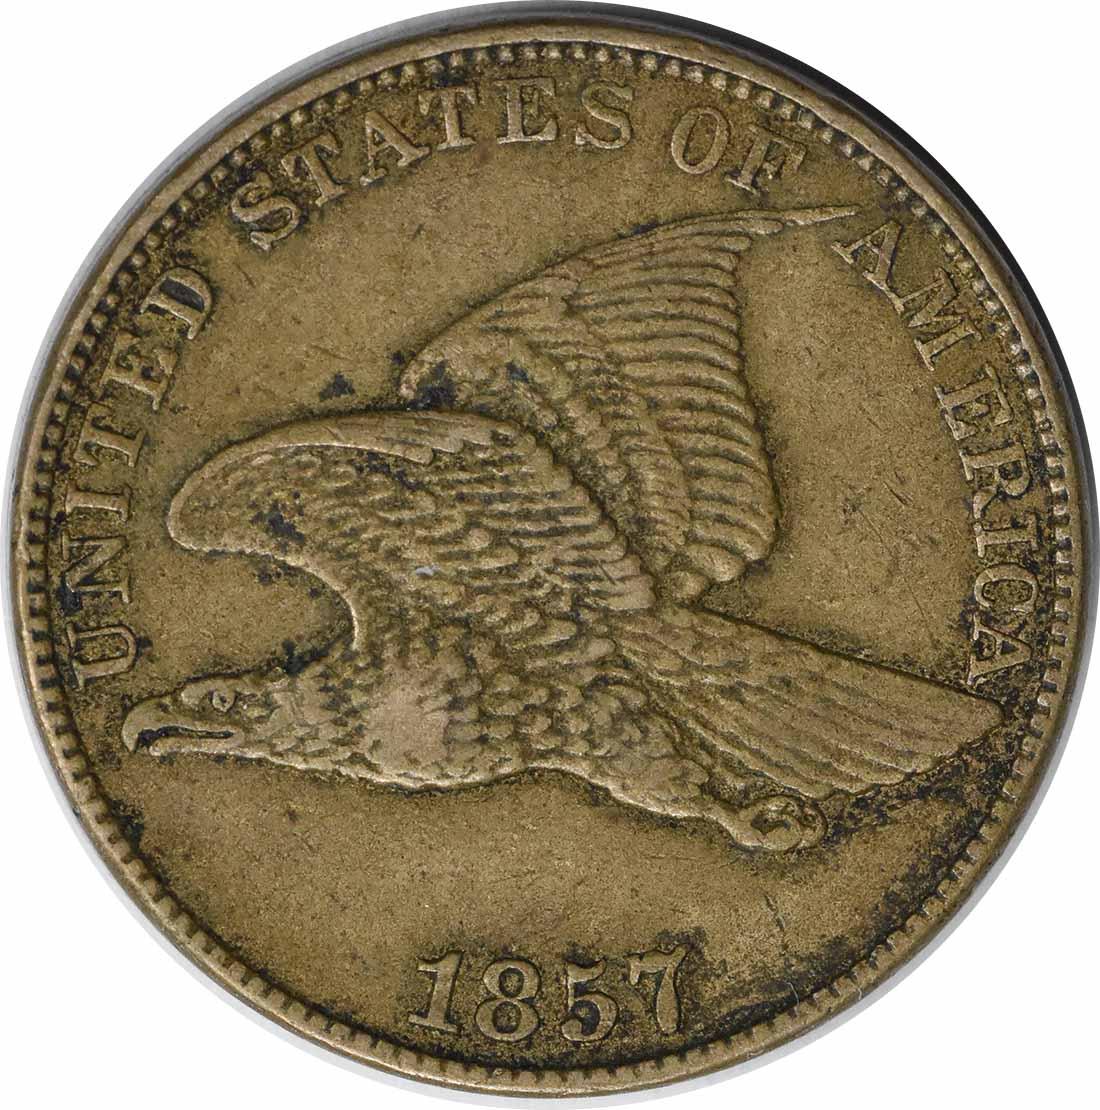 1857 Flying Eagle Cent EF Uncertified #1043